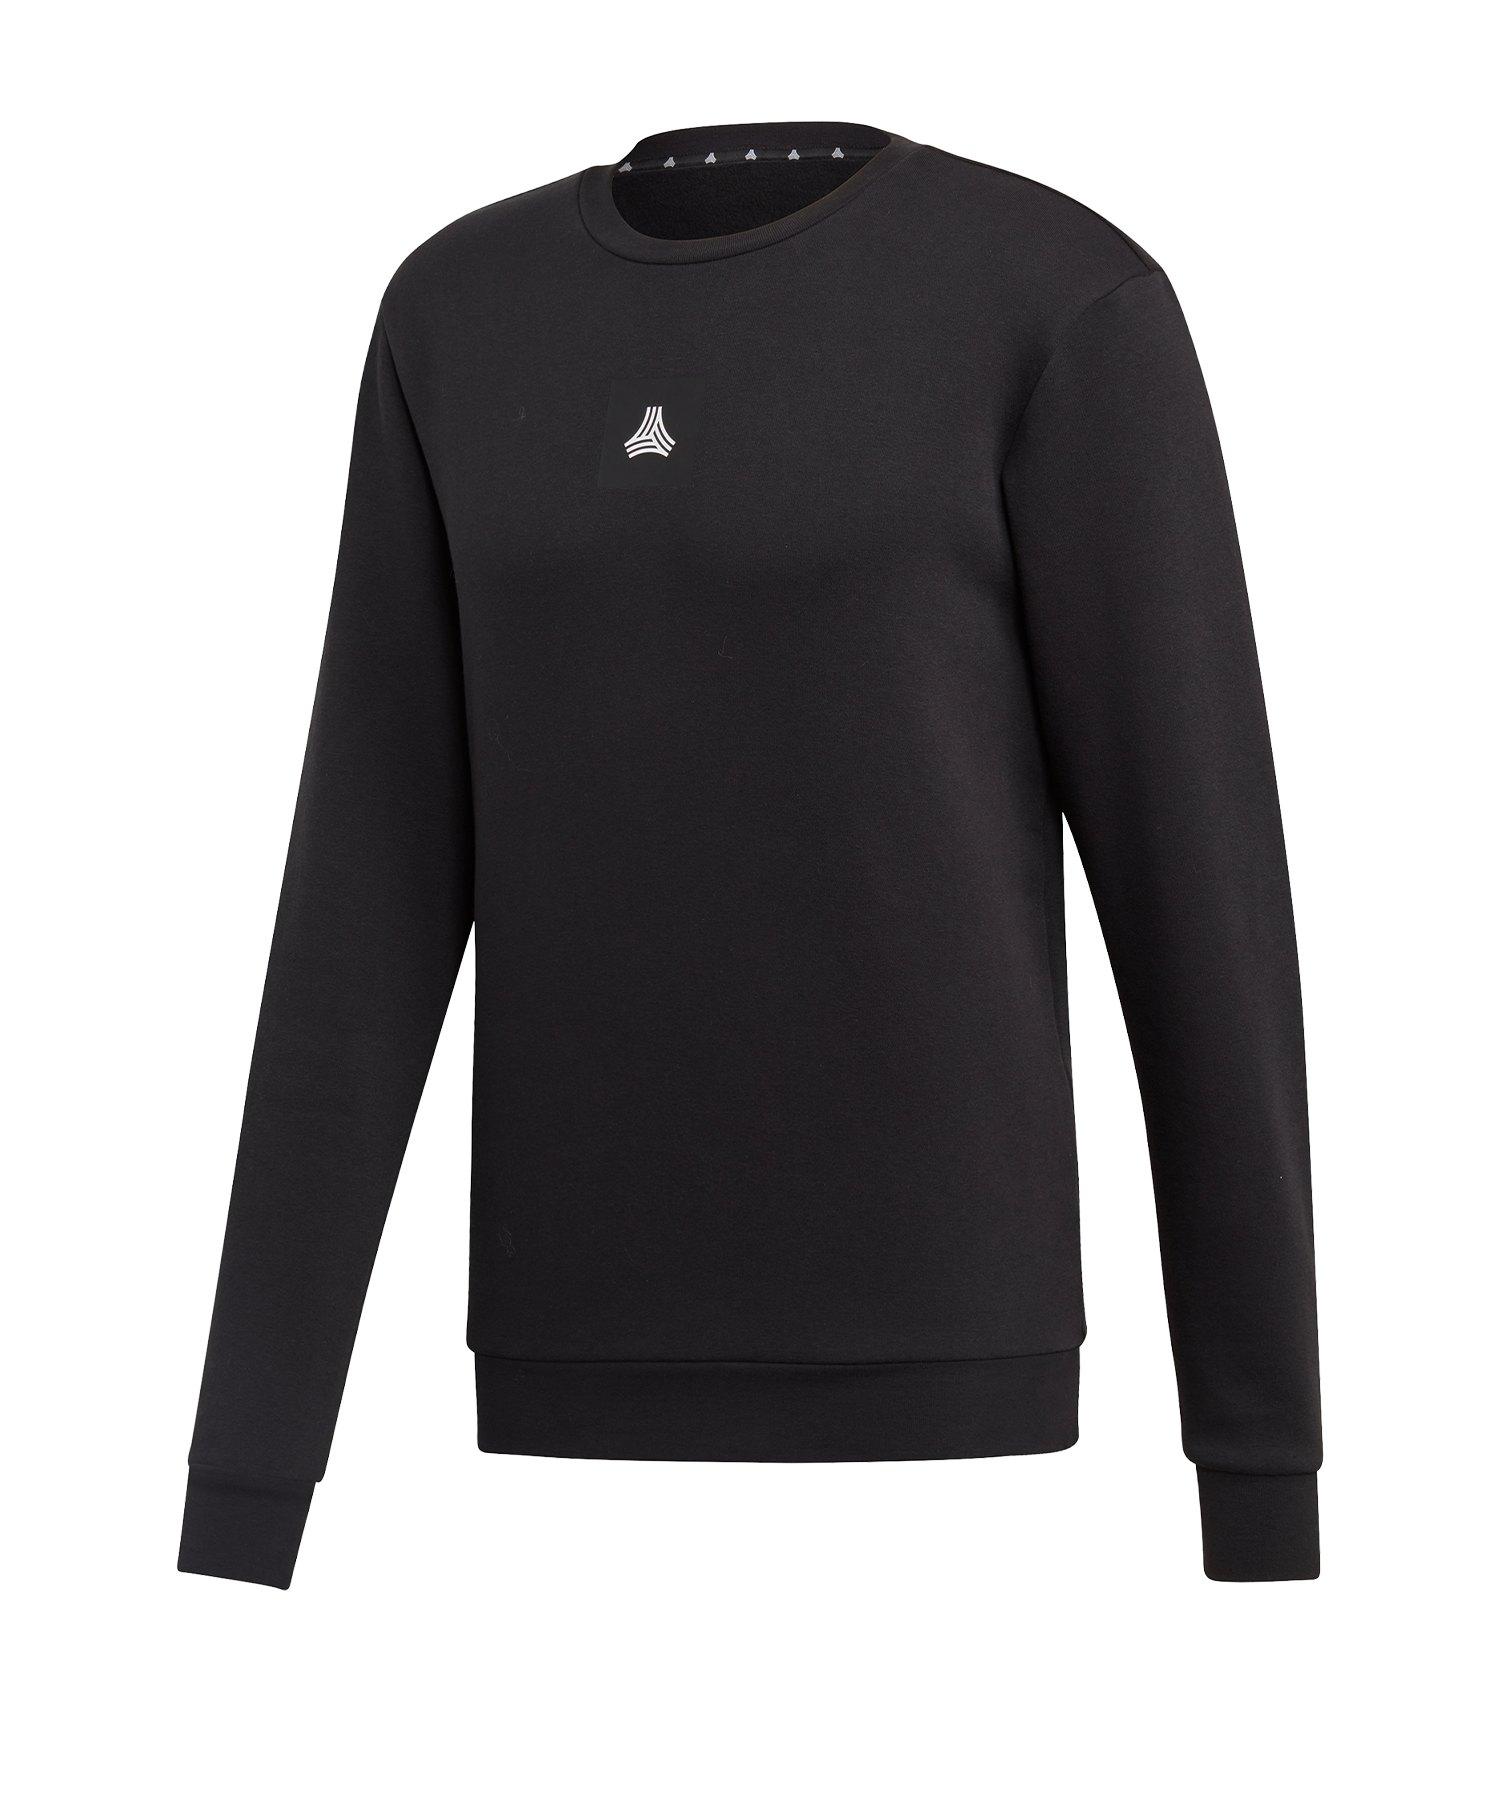 adidas Tango Sweatshirt Schwarz - schwarz